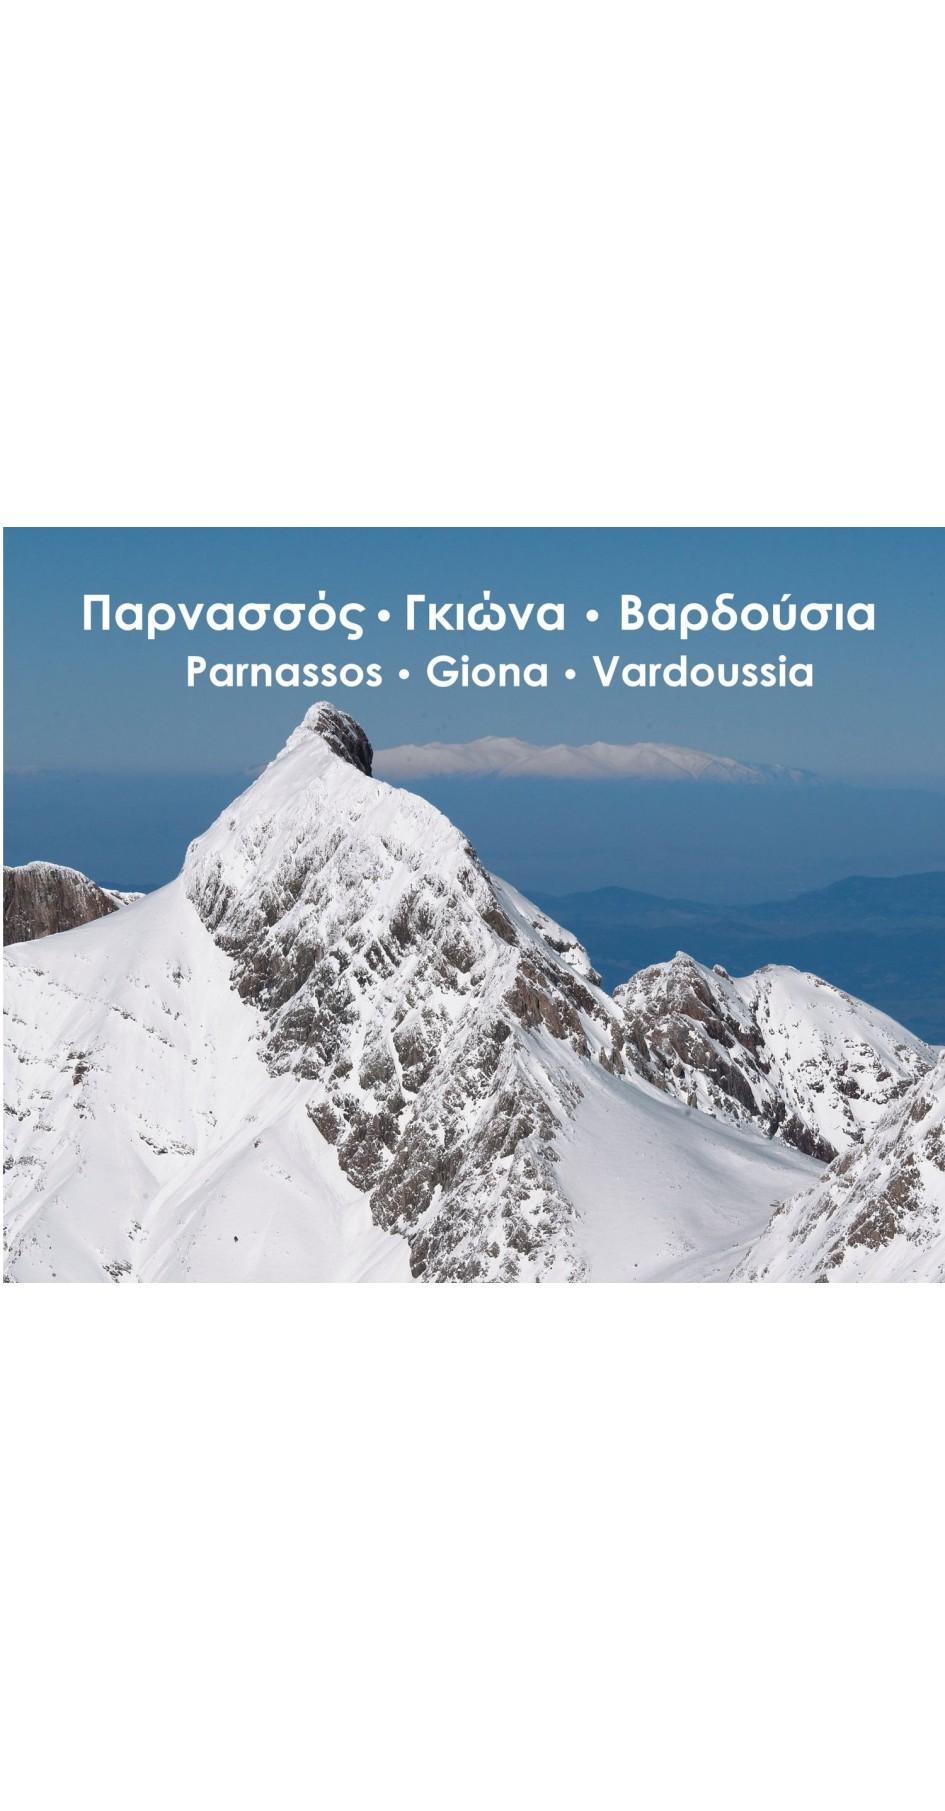 Parnassos - Giona - Vardoussia